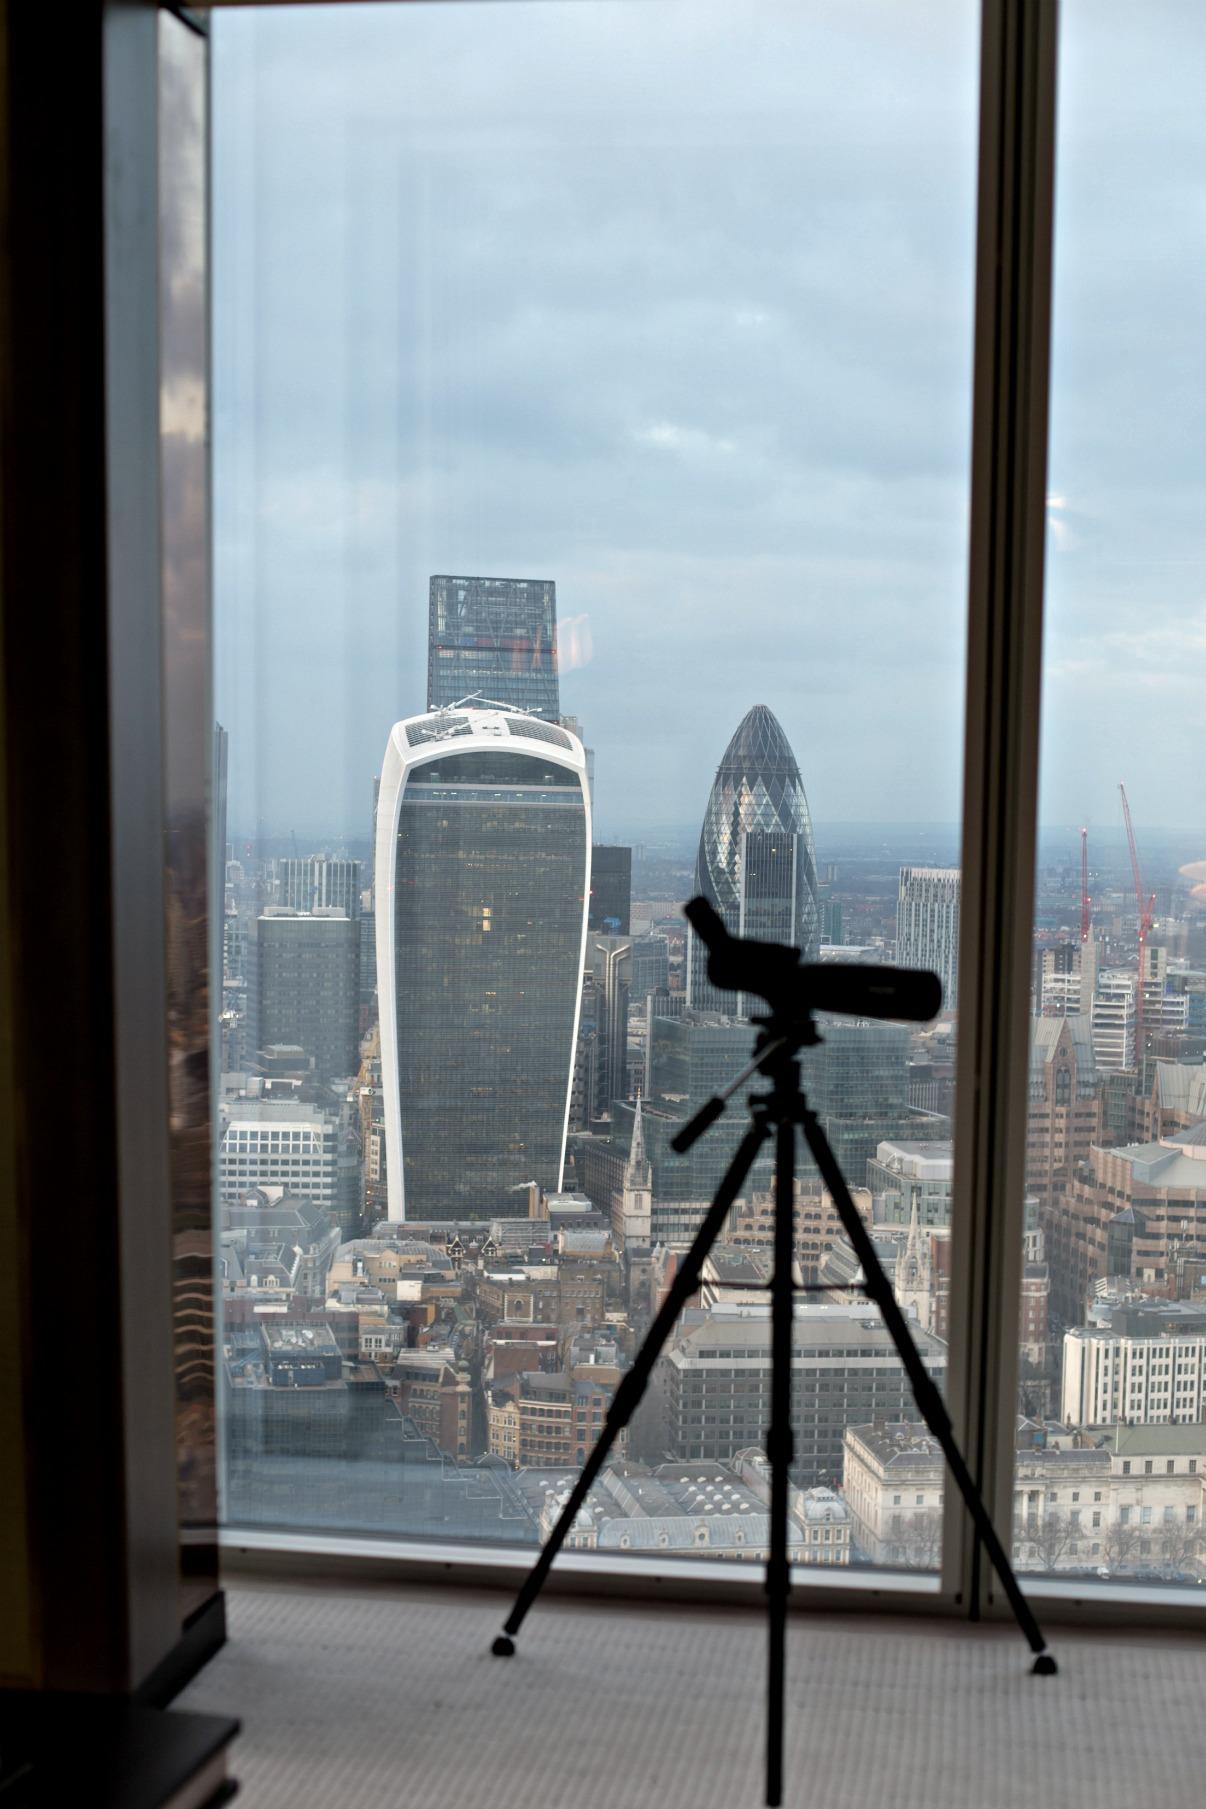 disi-couture-travel-shangri-la-hotel-shard-london-tower-bridge-england-edisa-shahini-05